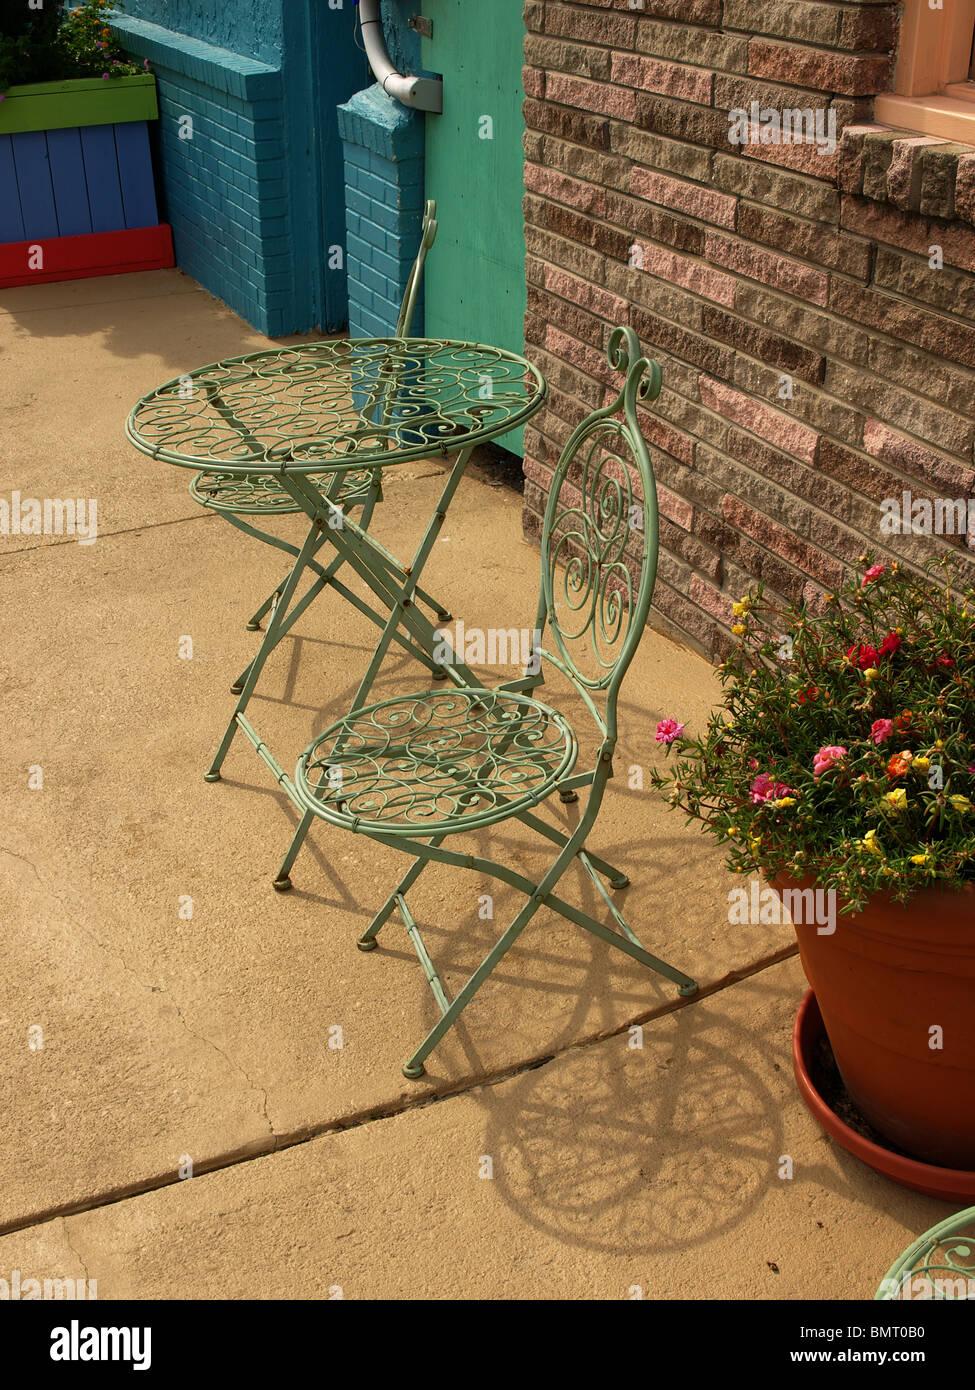 Tavolo Sedie Giardino Cemento.Metallo Mobili Da Giardino Tavolo Sedie Filo Verde Sul Patio Di